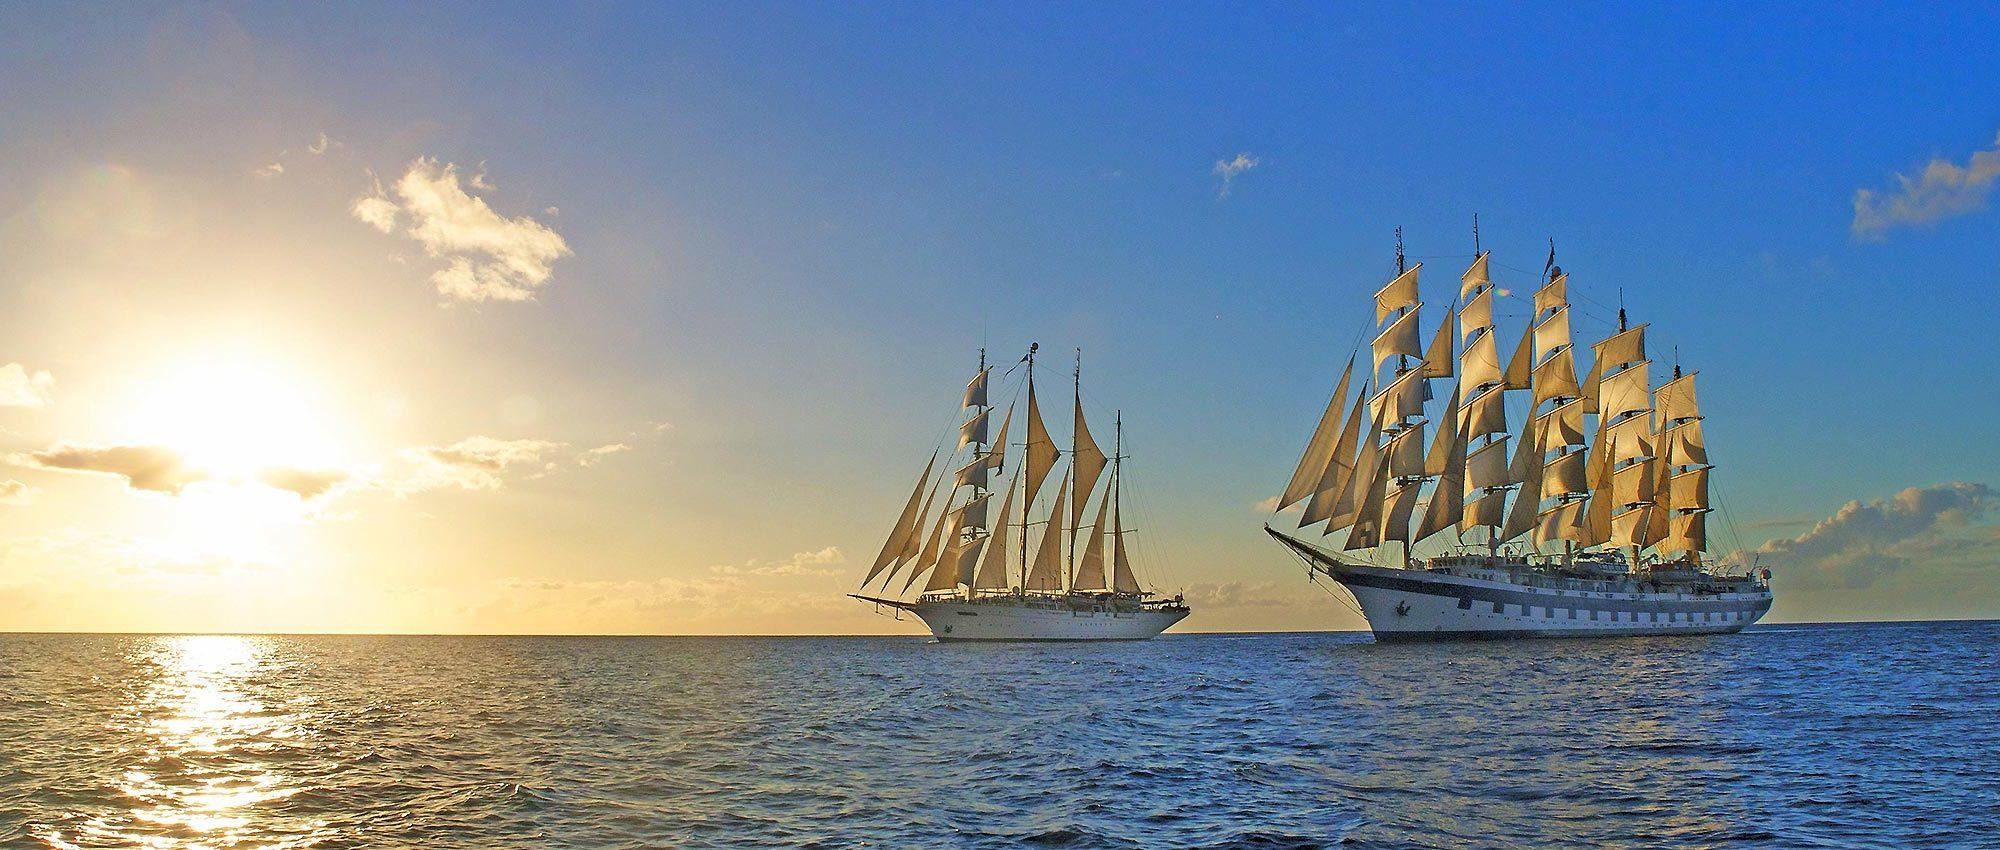 Singlereisen zum Thema Kreuzfahrten